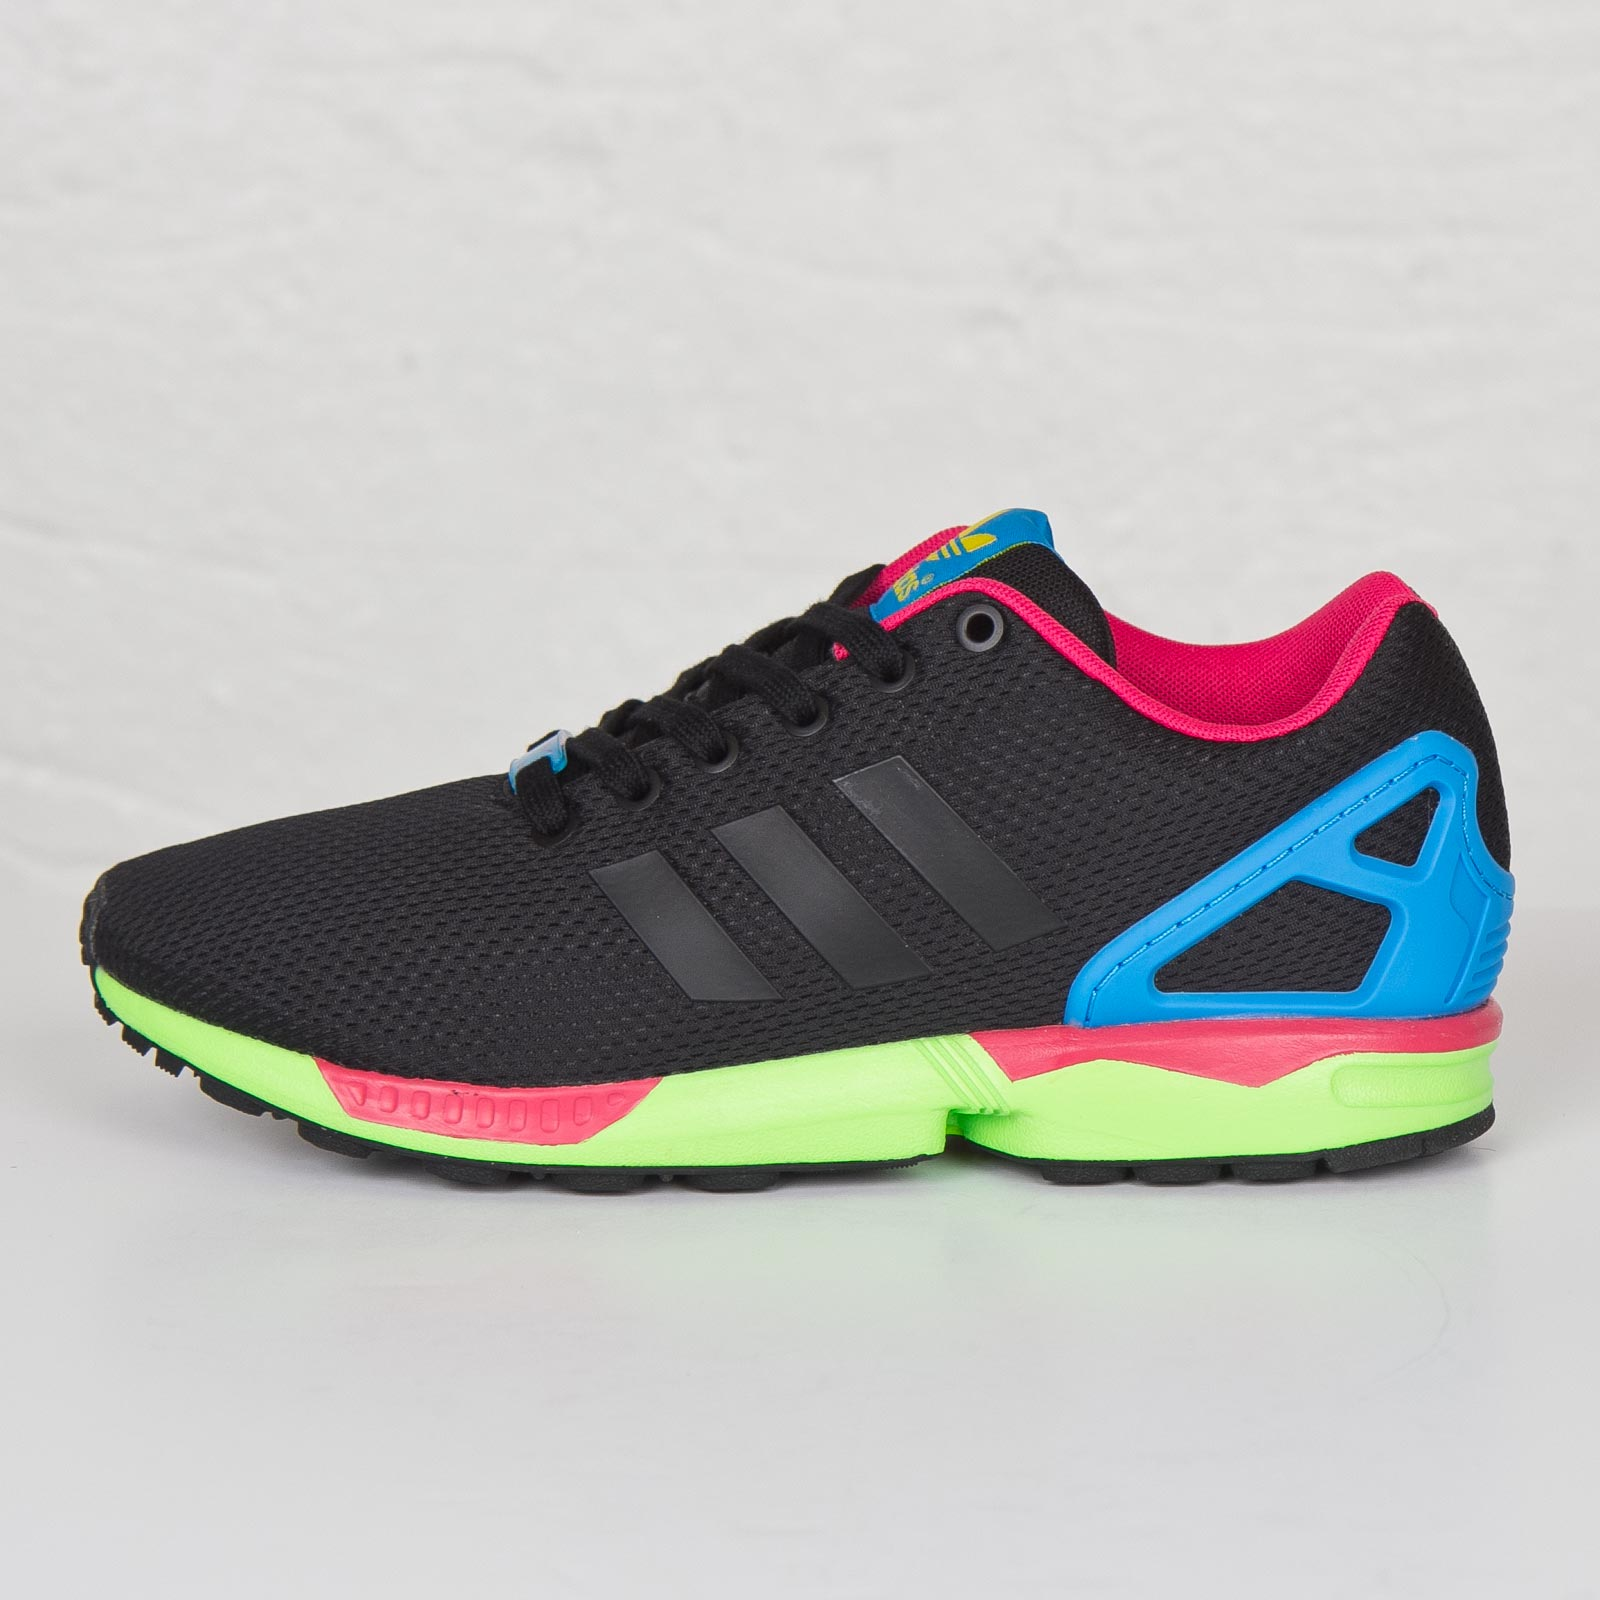 b8883727e adidas ZX Flux - B34490 - Sneakersnstuff